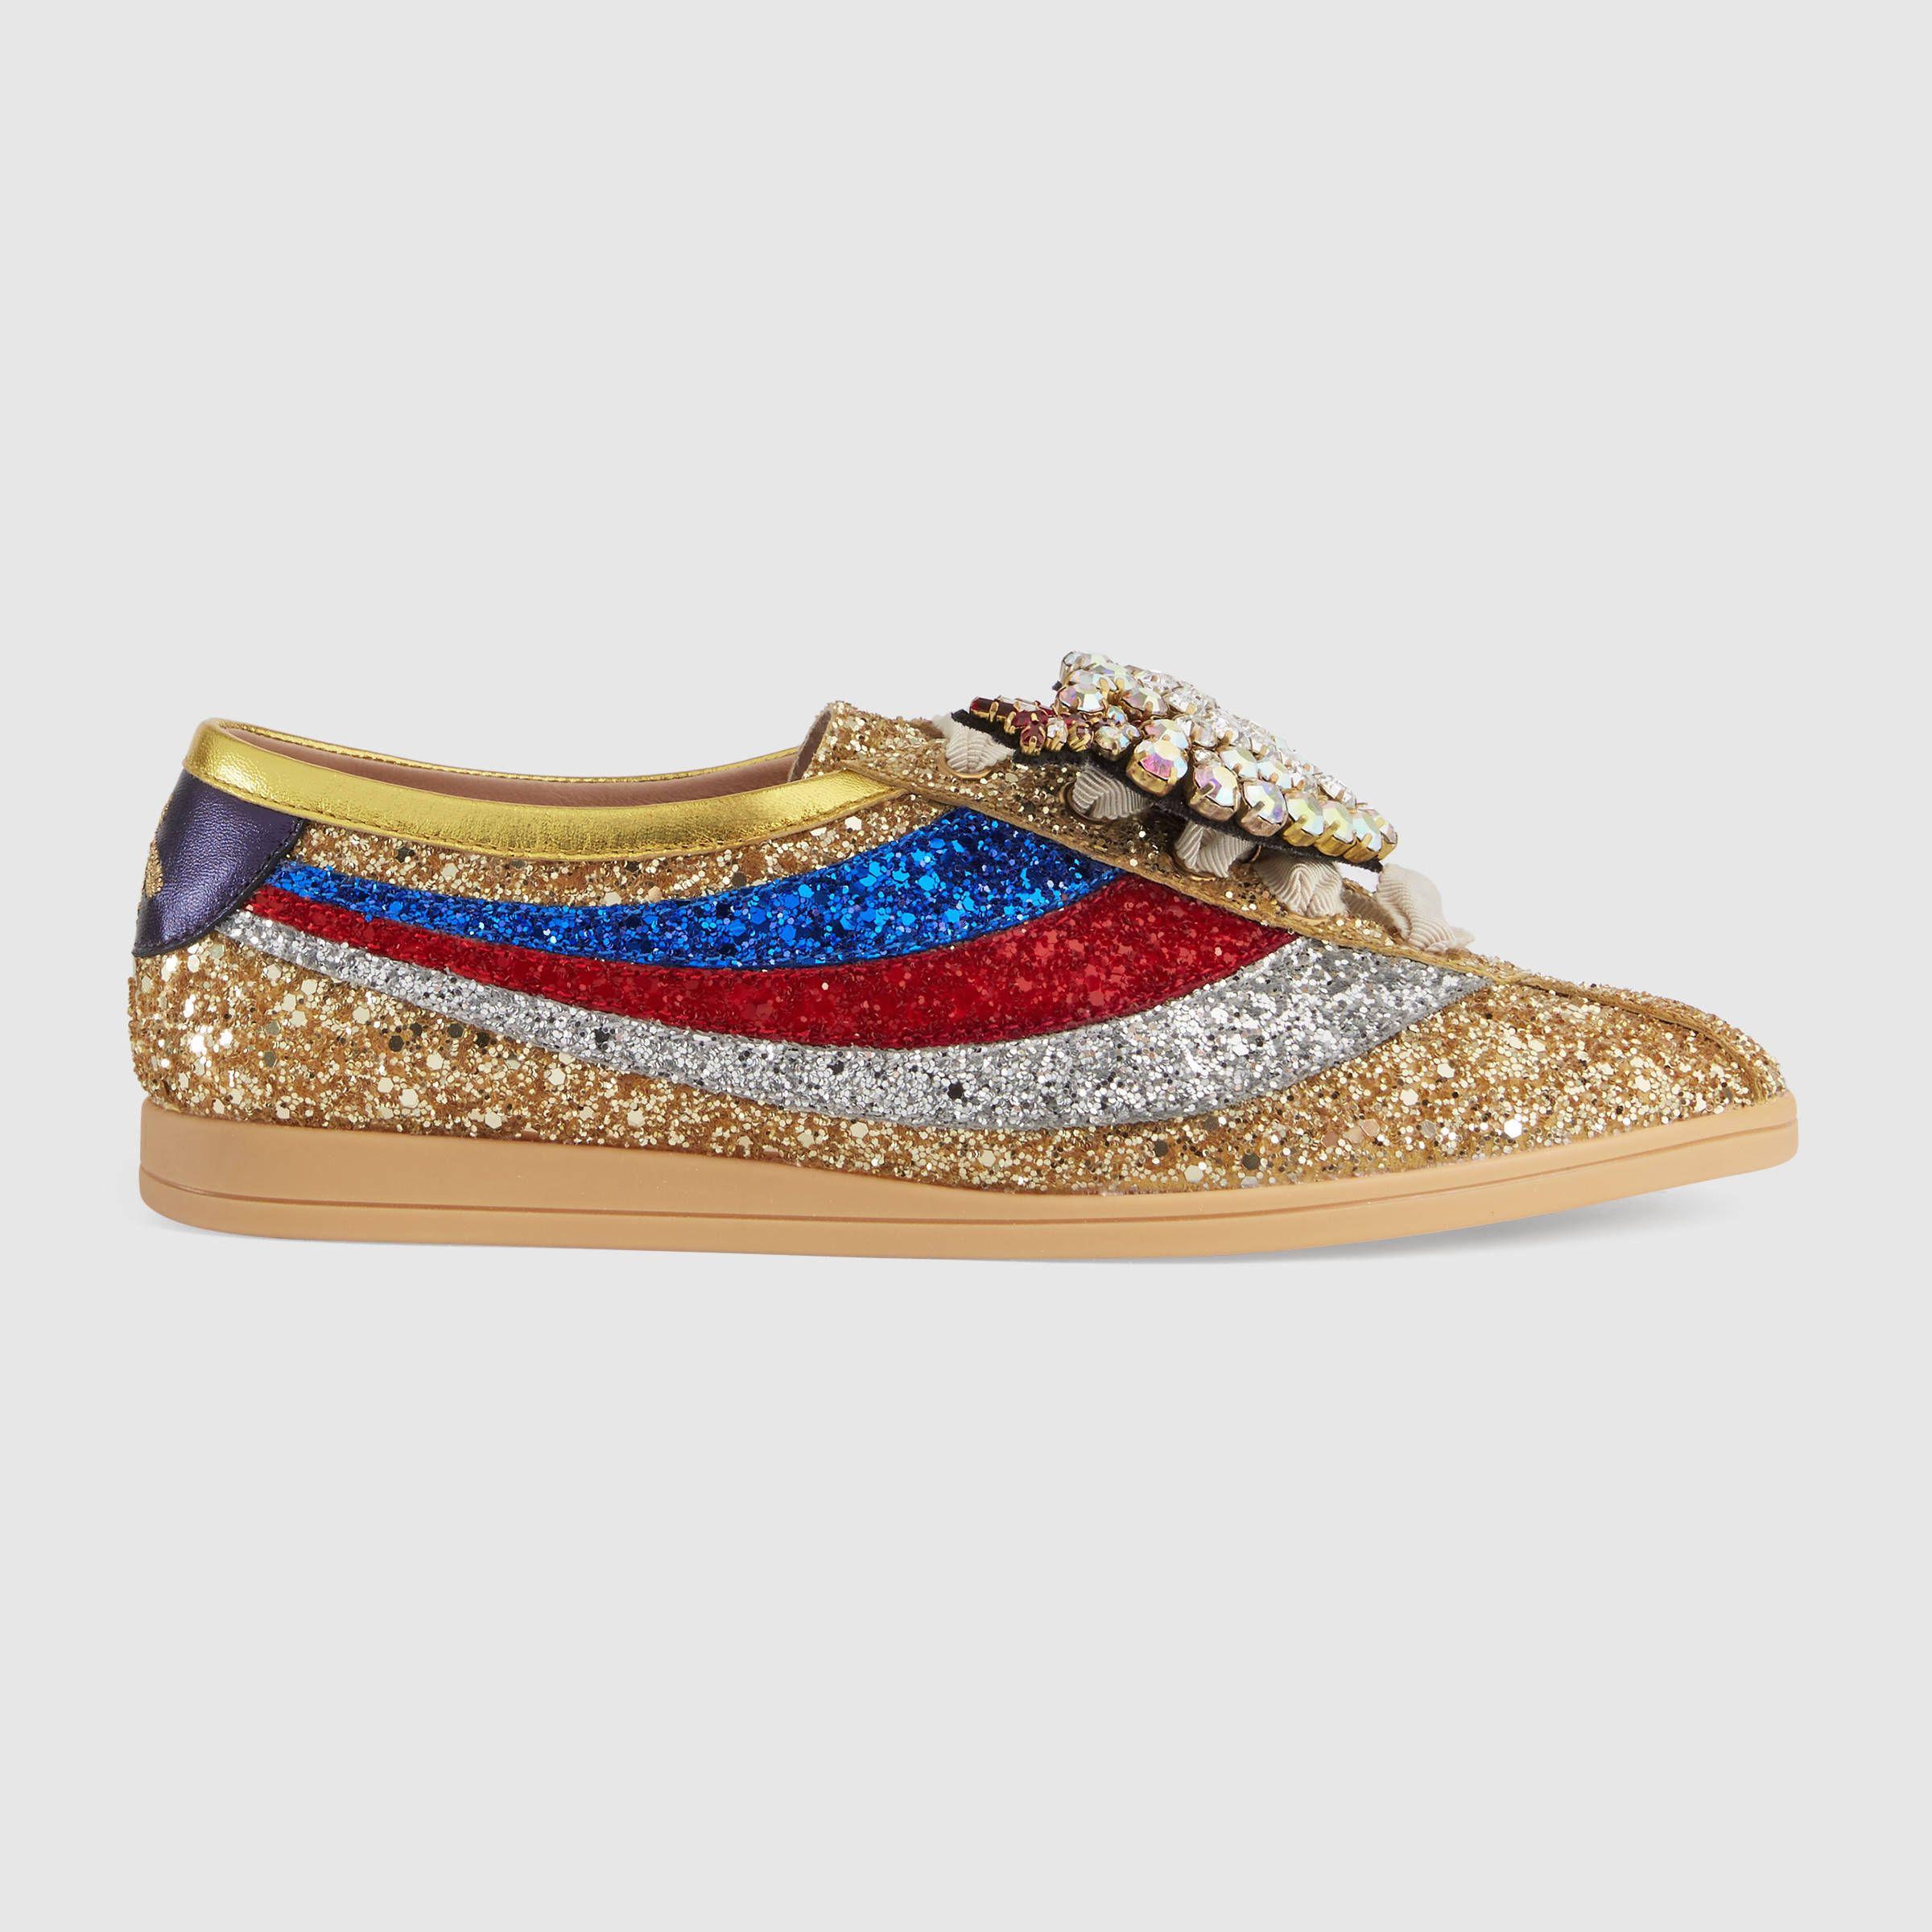 c1b4896722e3 Falacer glitter sneaker with Web - Gucci Women's Sneakers 494609KSPE08072